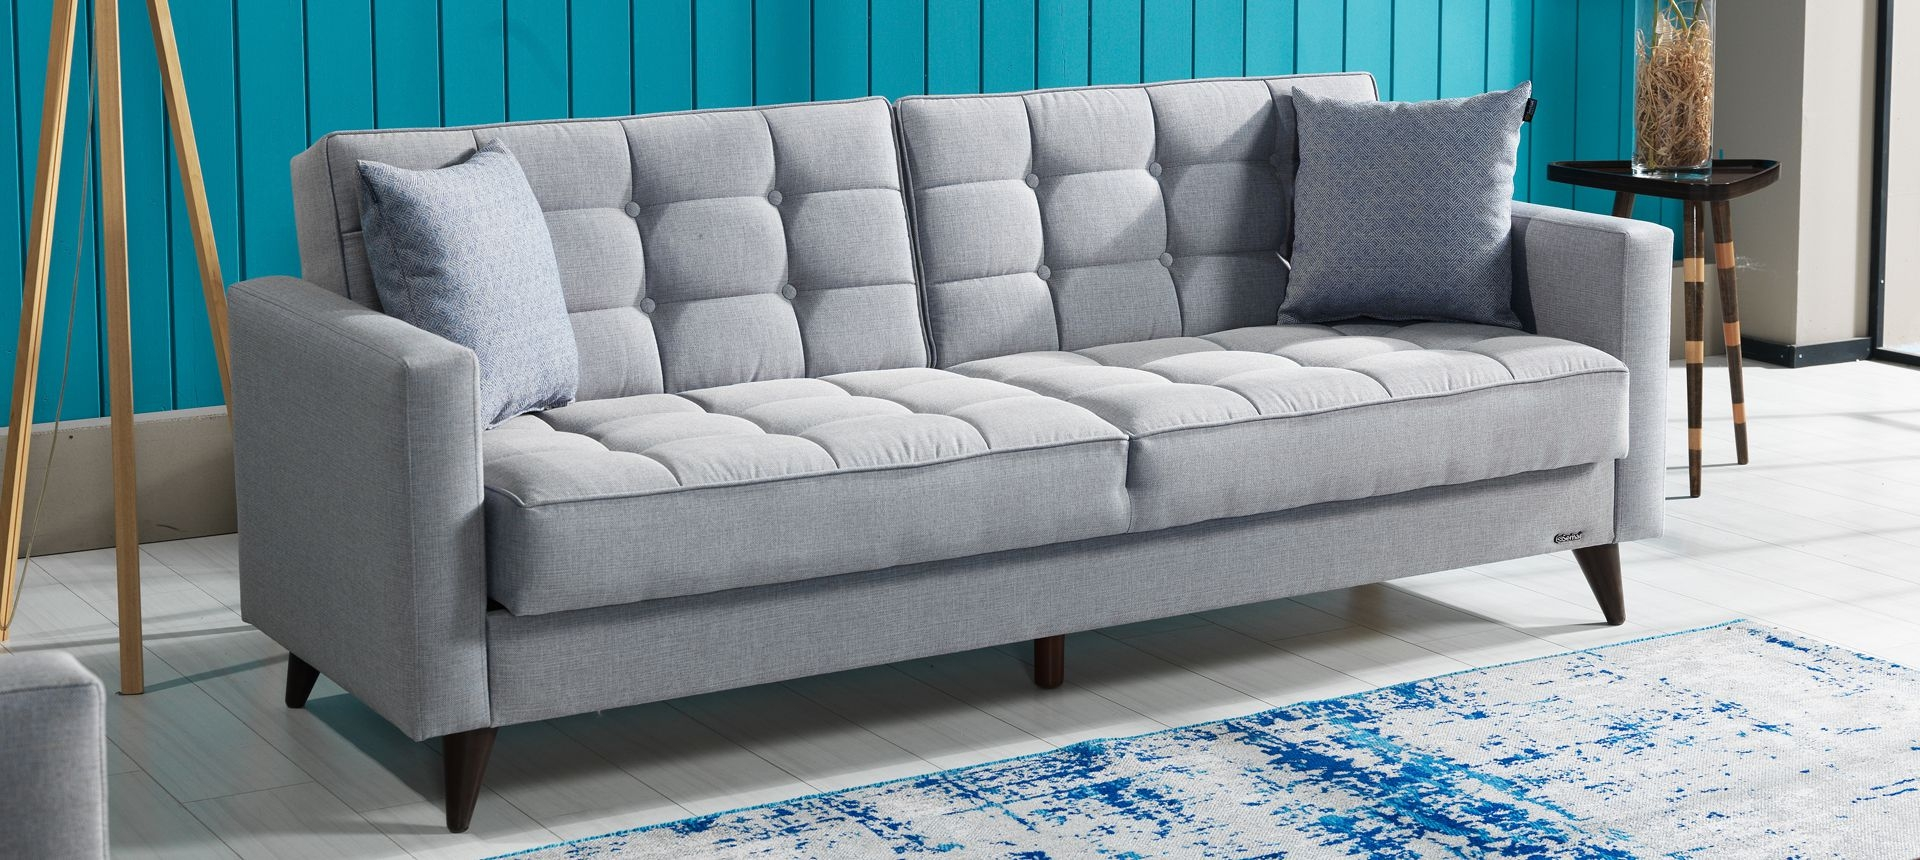 Canapea extensibila cu lada de depozitare, tapitata cu stofa 3 locuri Orlando Gri K1, l214xA84xH86 cm